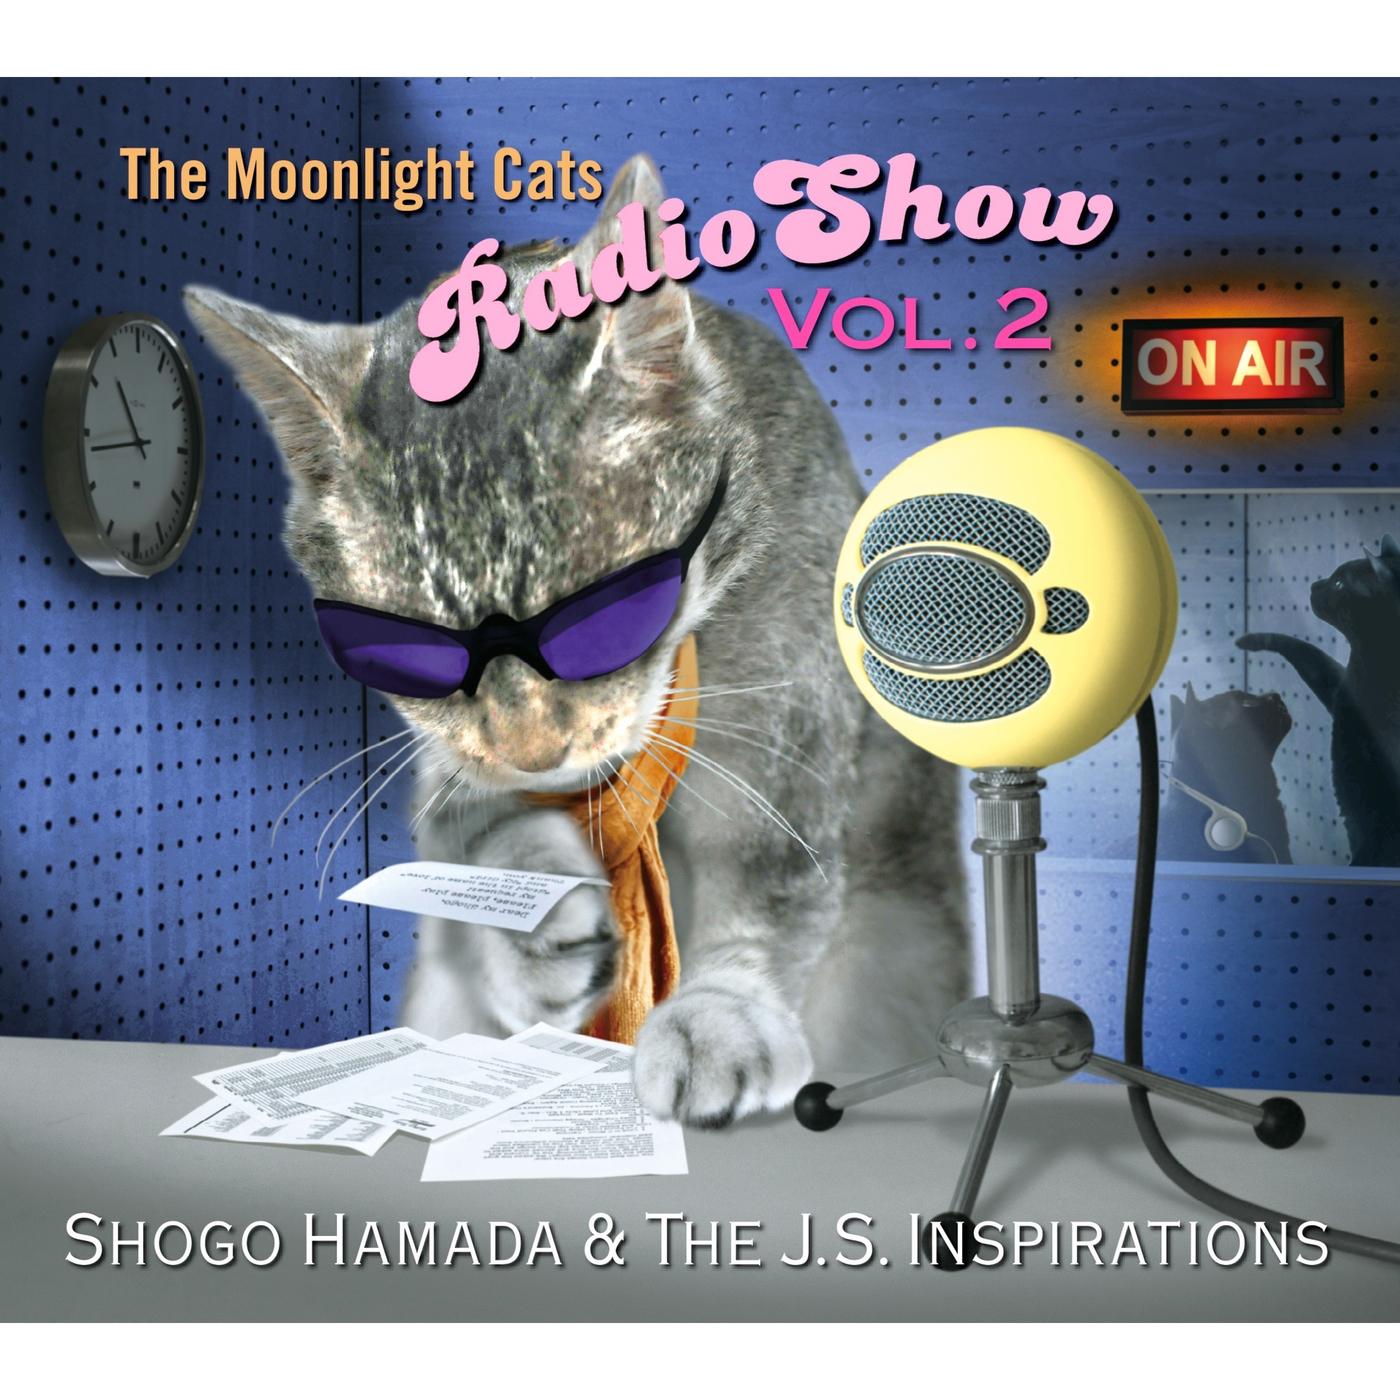 The Moonlight Cats Radio Show Vol. 2 - Shogo Hamada & The J.S. Inspirations